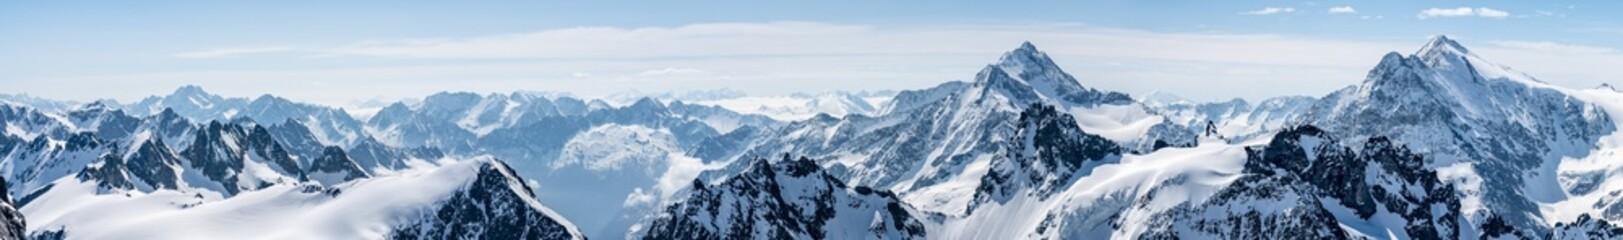 Switzerland, Panoramic view on Snow Alps and Blue Sky around Titlis mountain